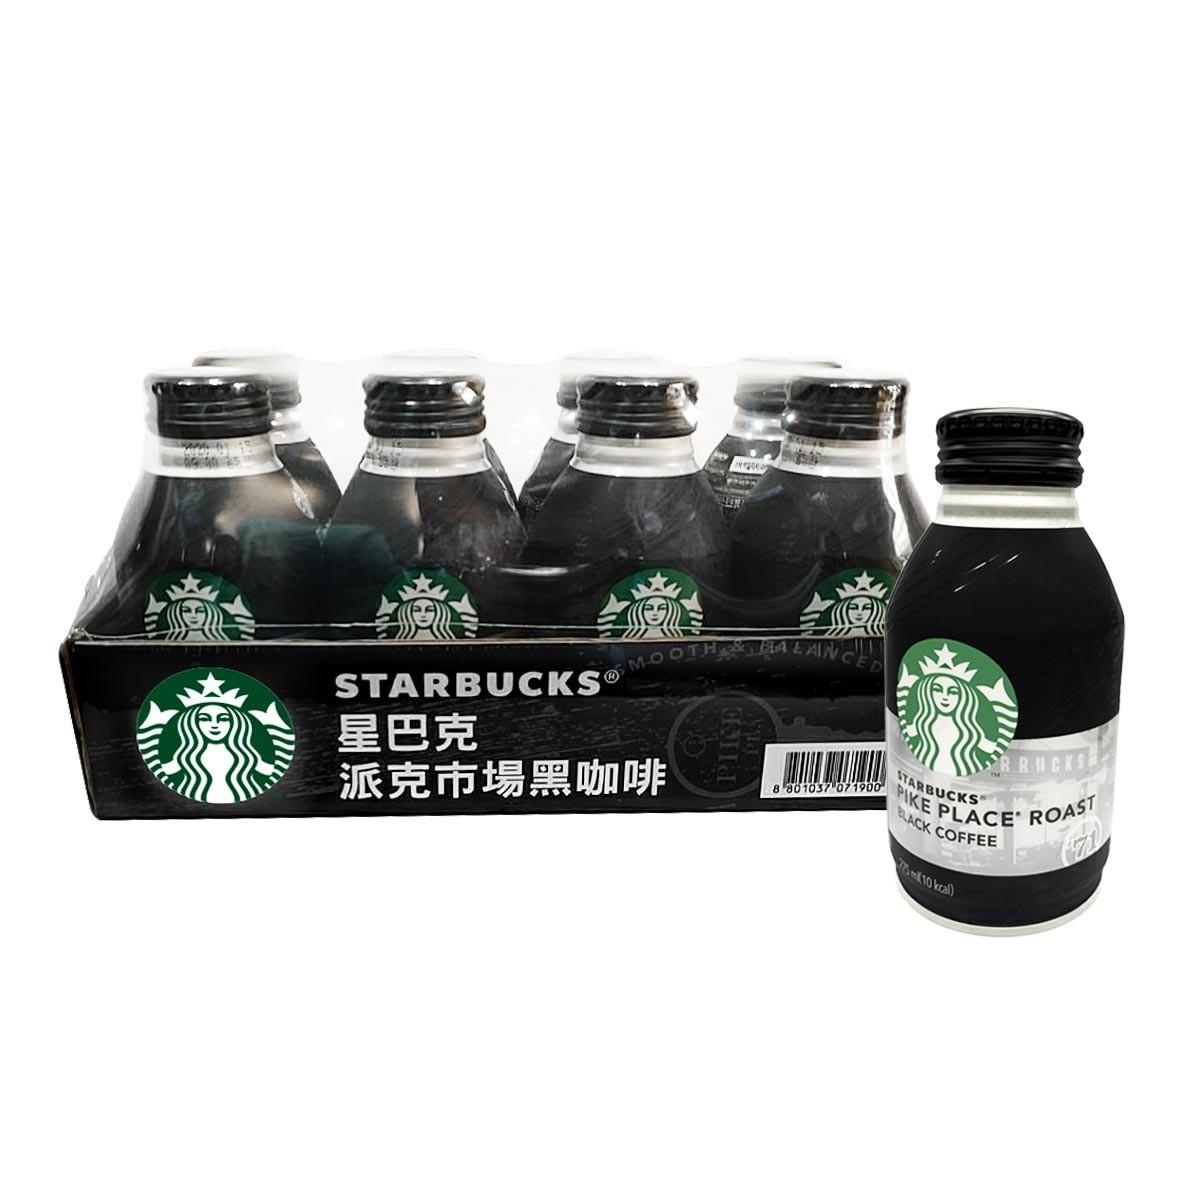 Starbucks 星巴克 派克市場黑咖啡